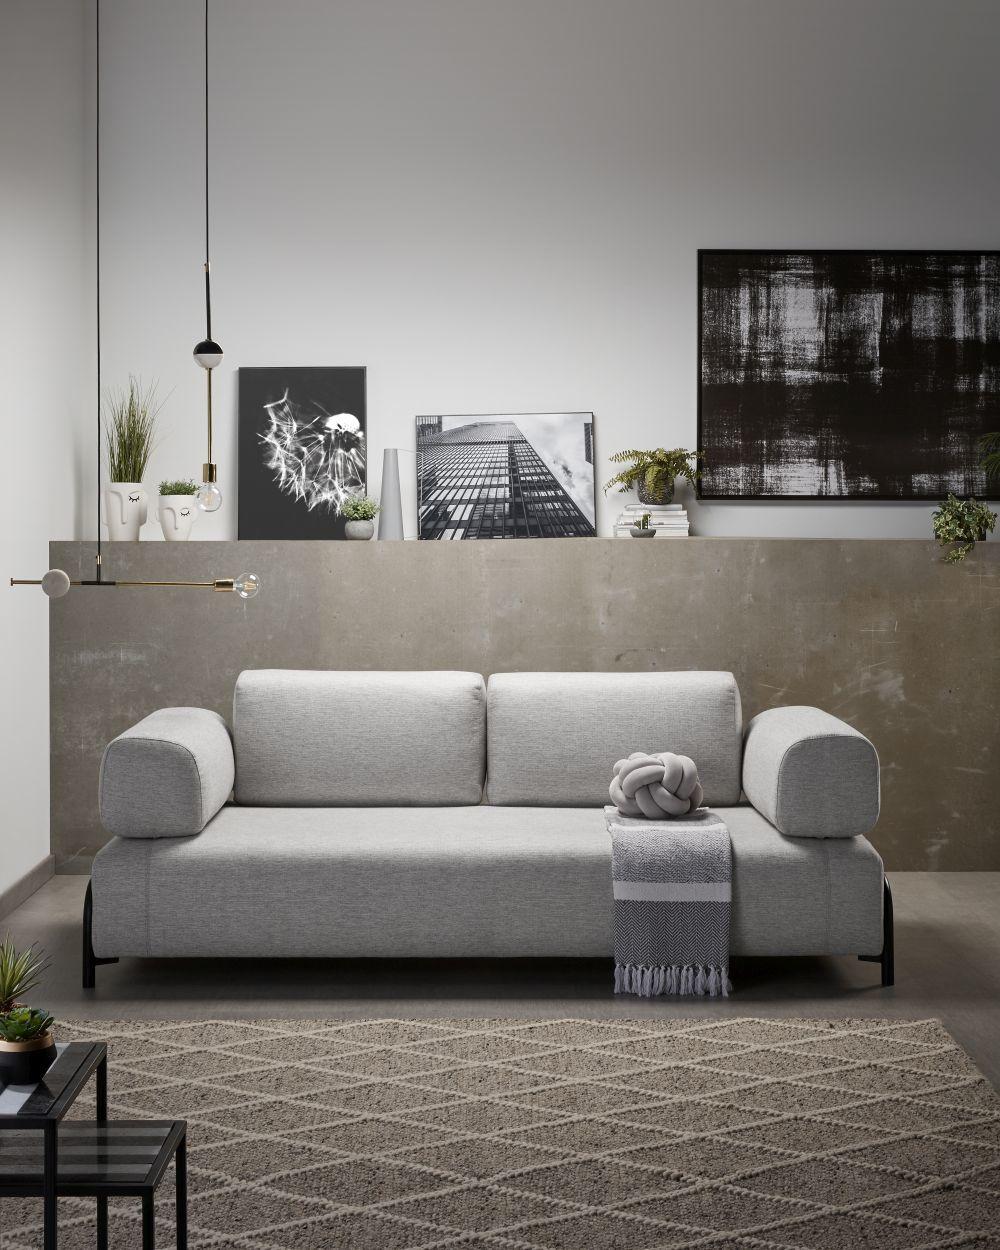 Sofá modular Compo y alfombra Lilya de Kave Home